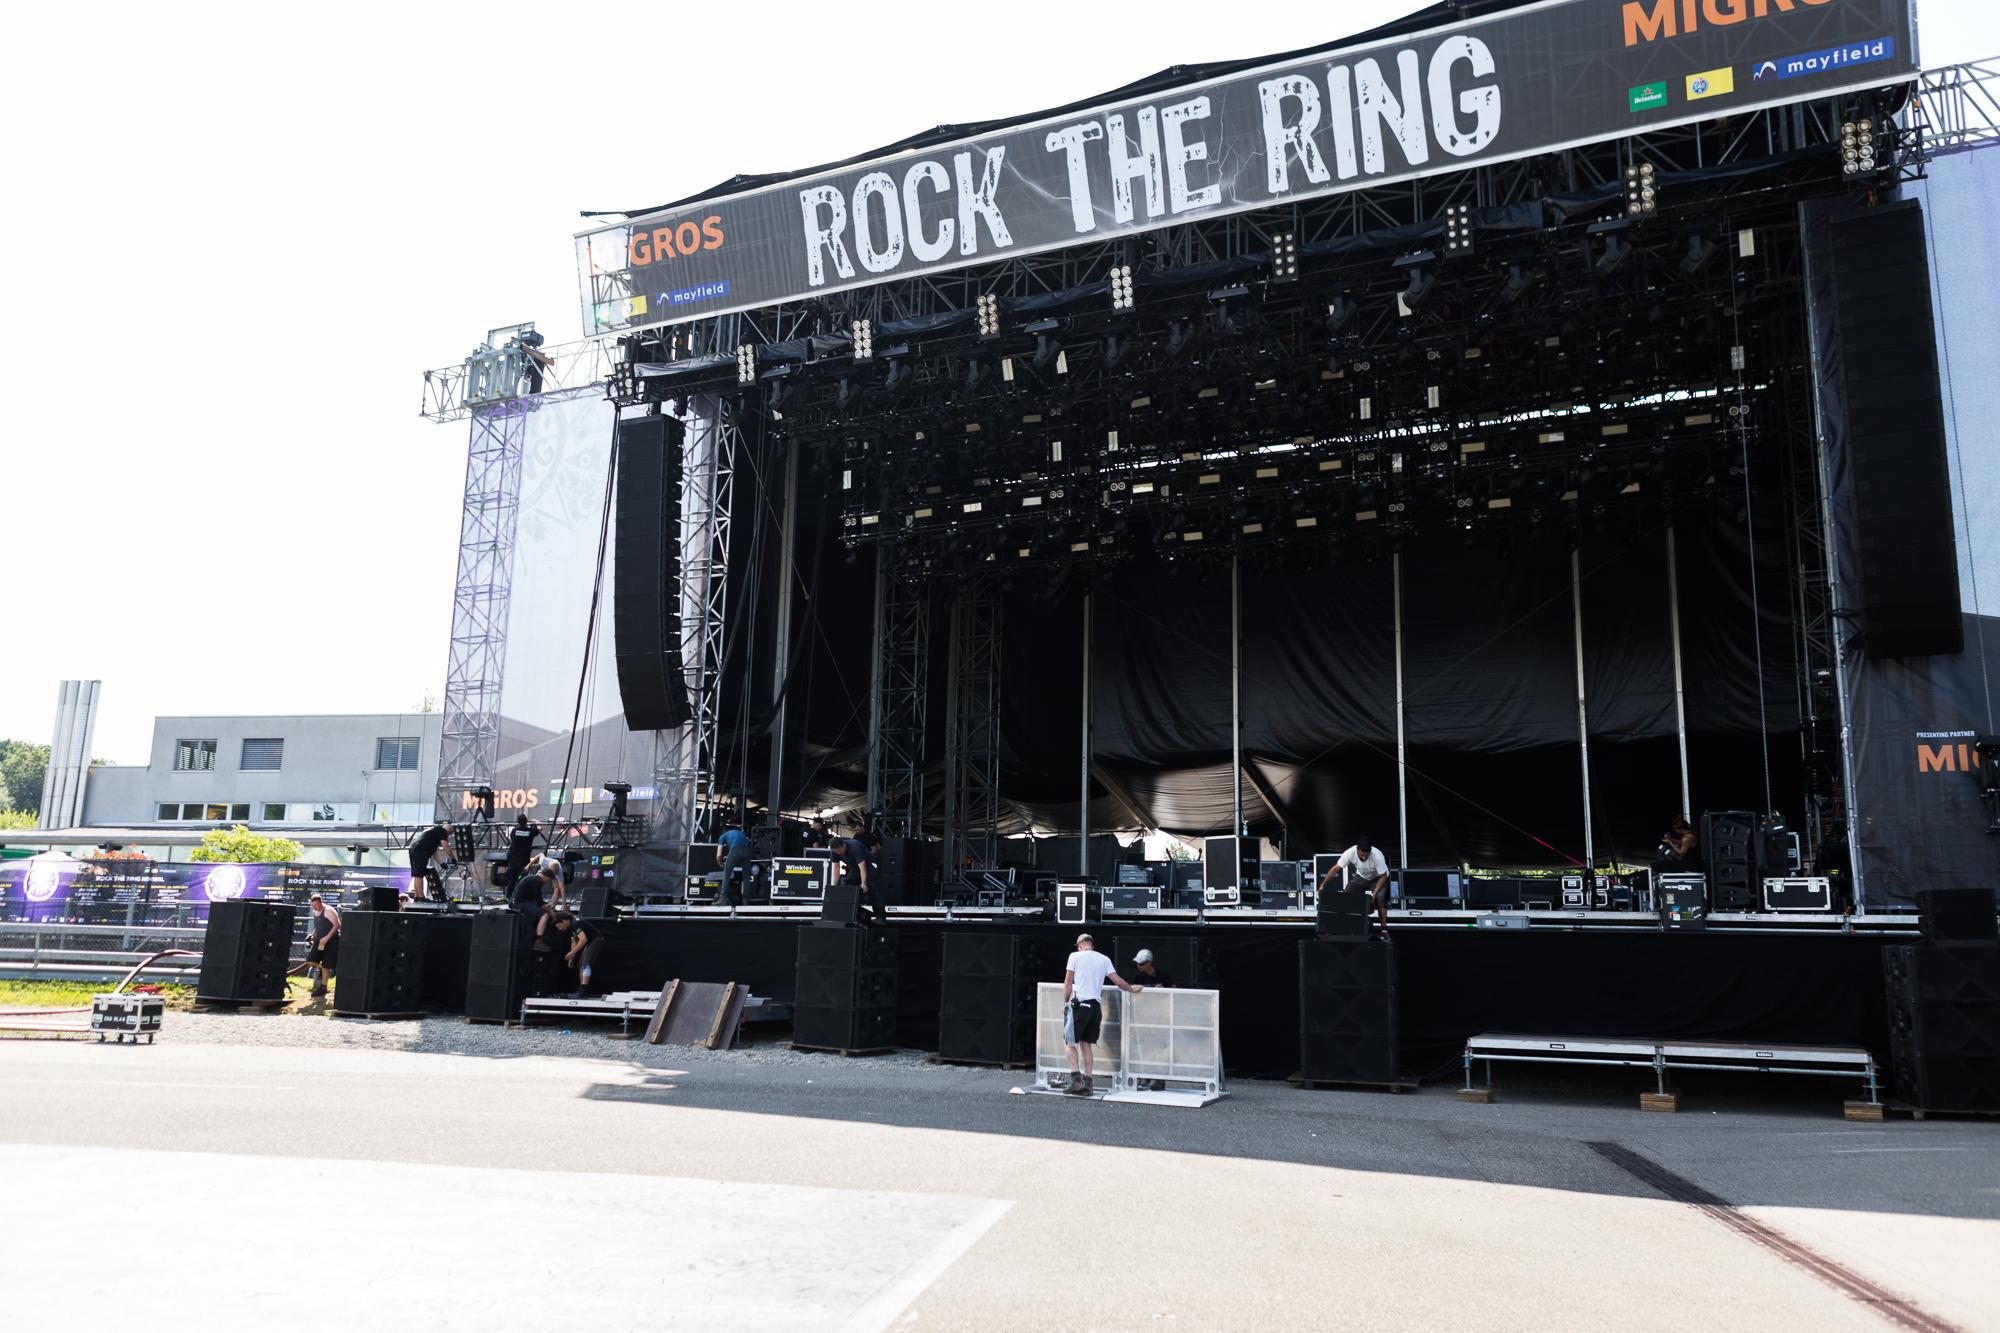 Rock The Ring, Hinwil, 19.06.2018(Bild: Michelle Brügger)